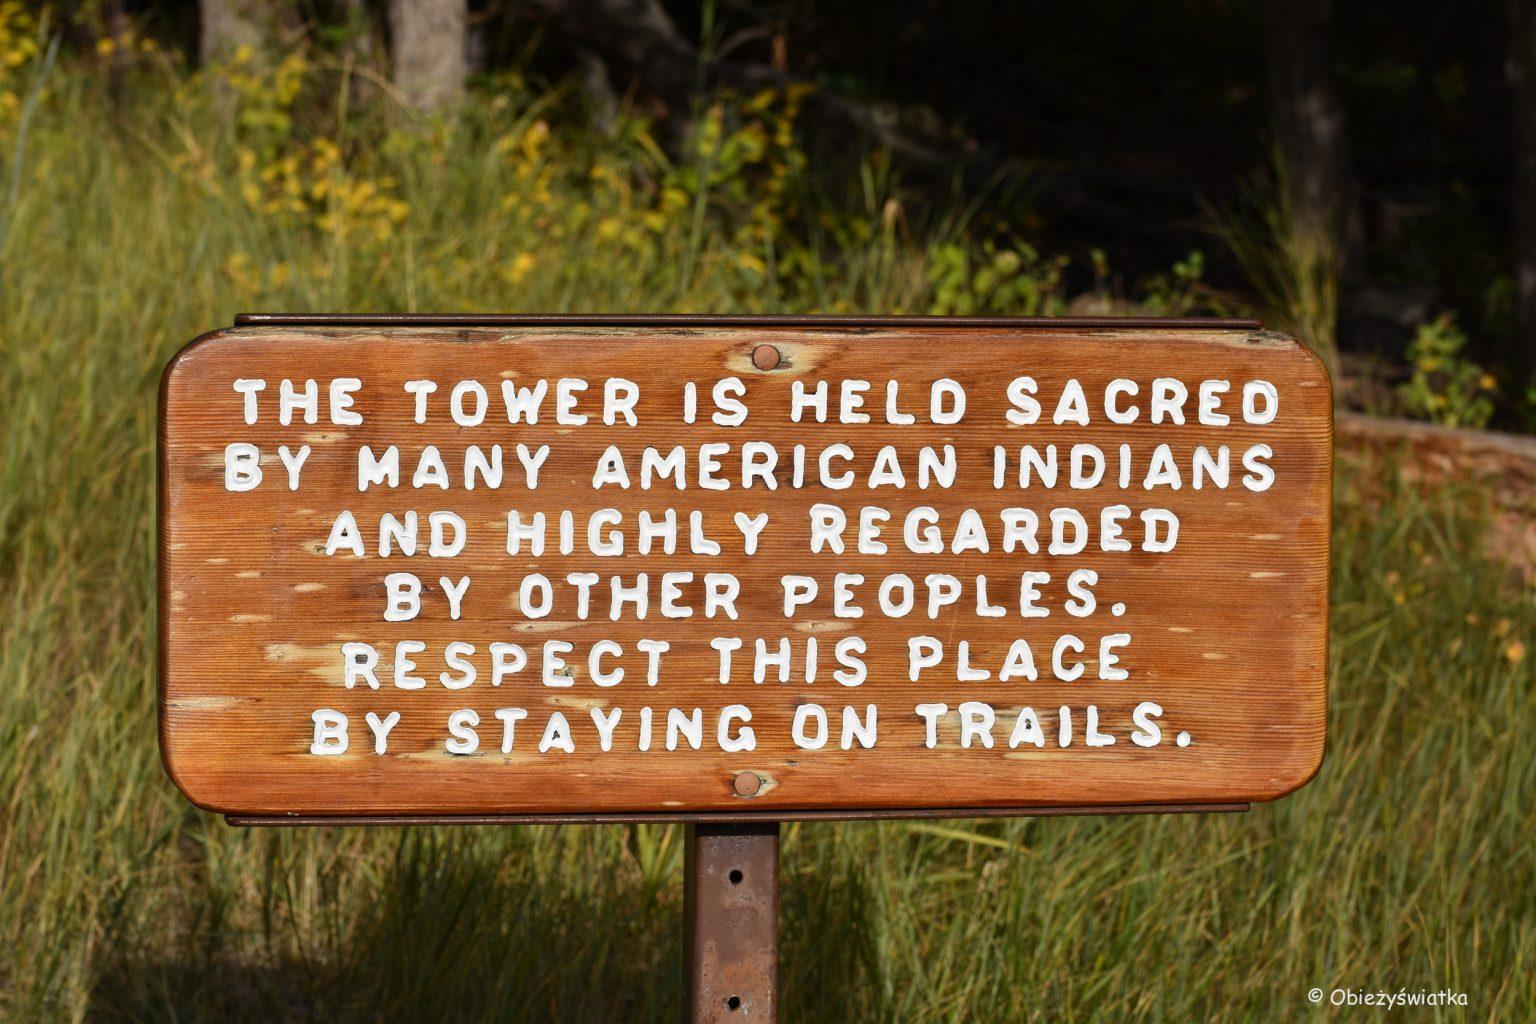 Święta góra - Devils Tower National Monument, Wyoming, USA